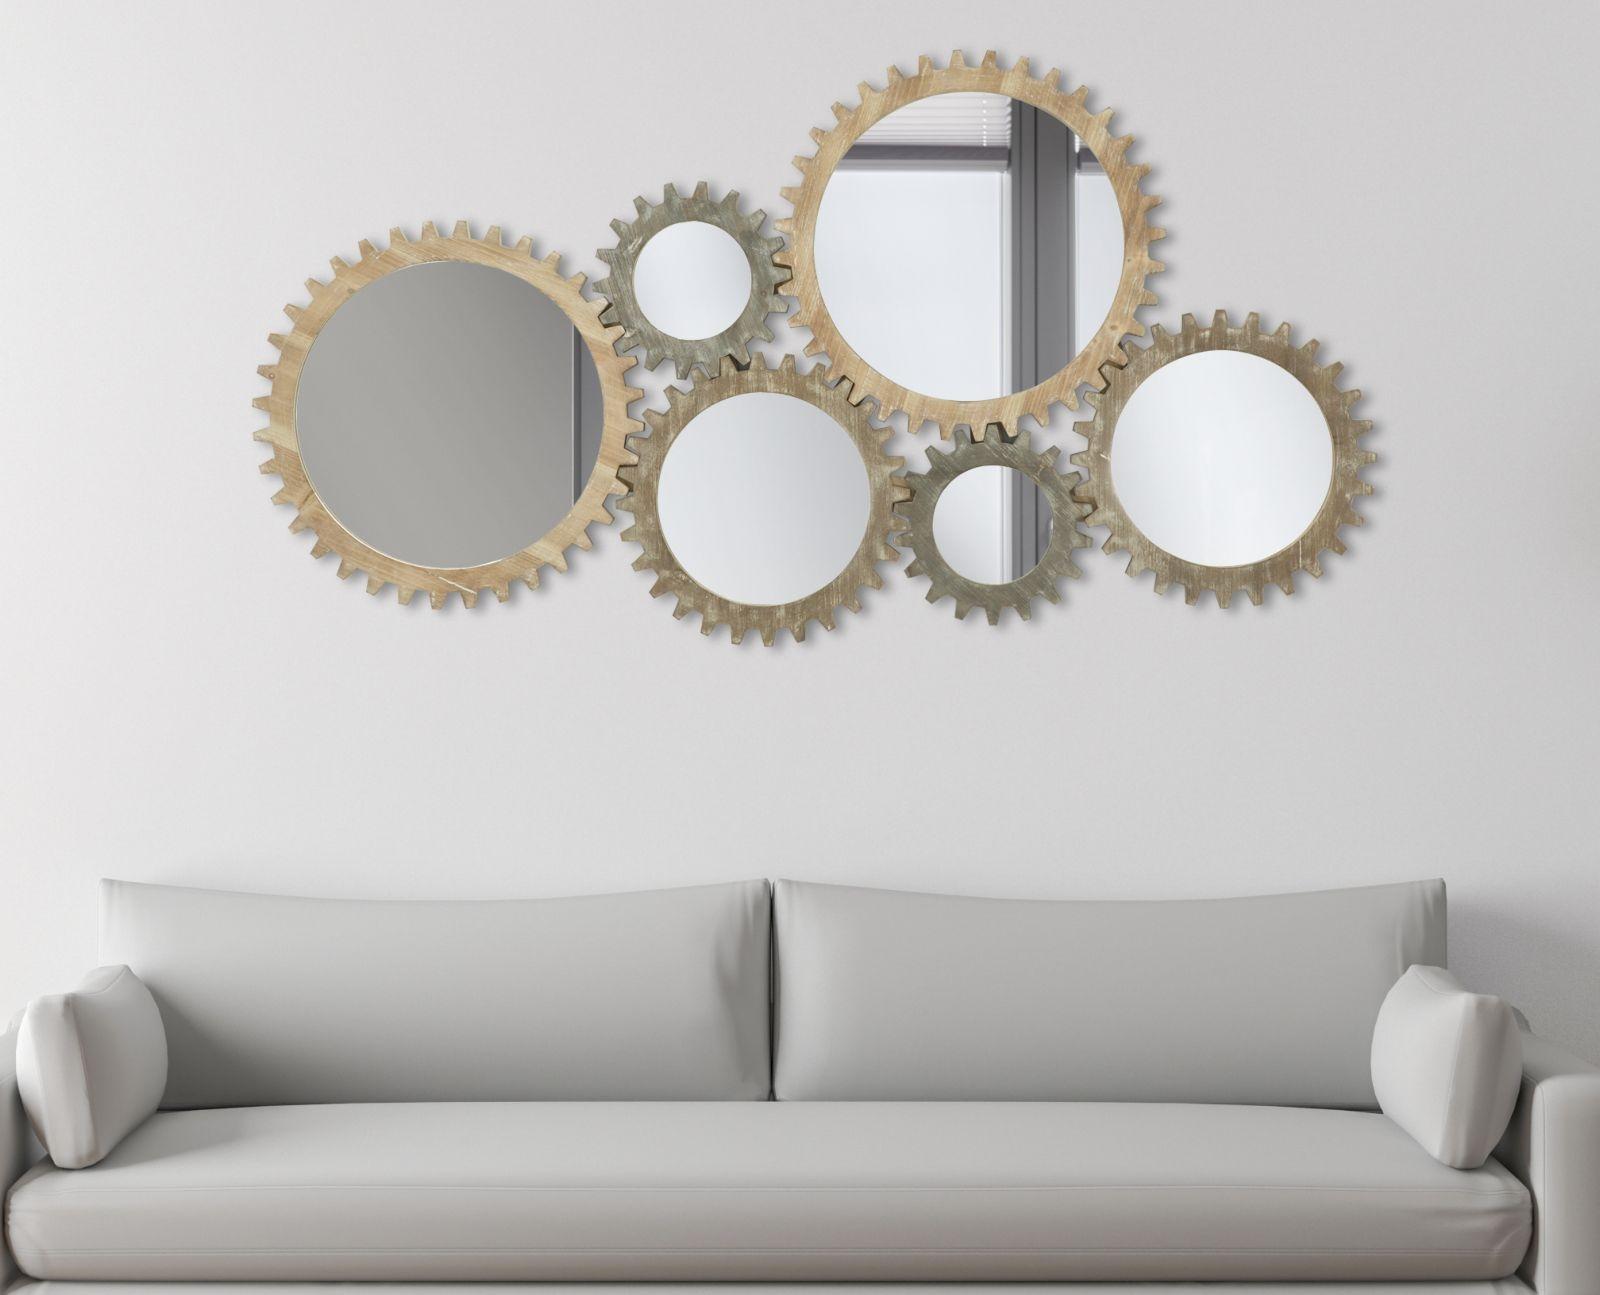 Decoratiune de perete cu oglinda, din MDF Ingranaggio Natural, l137xA3xH73,5 cm imagine